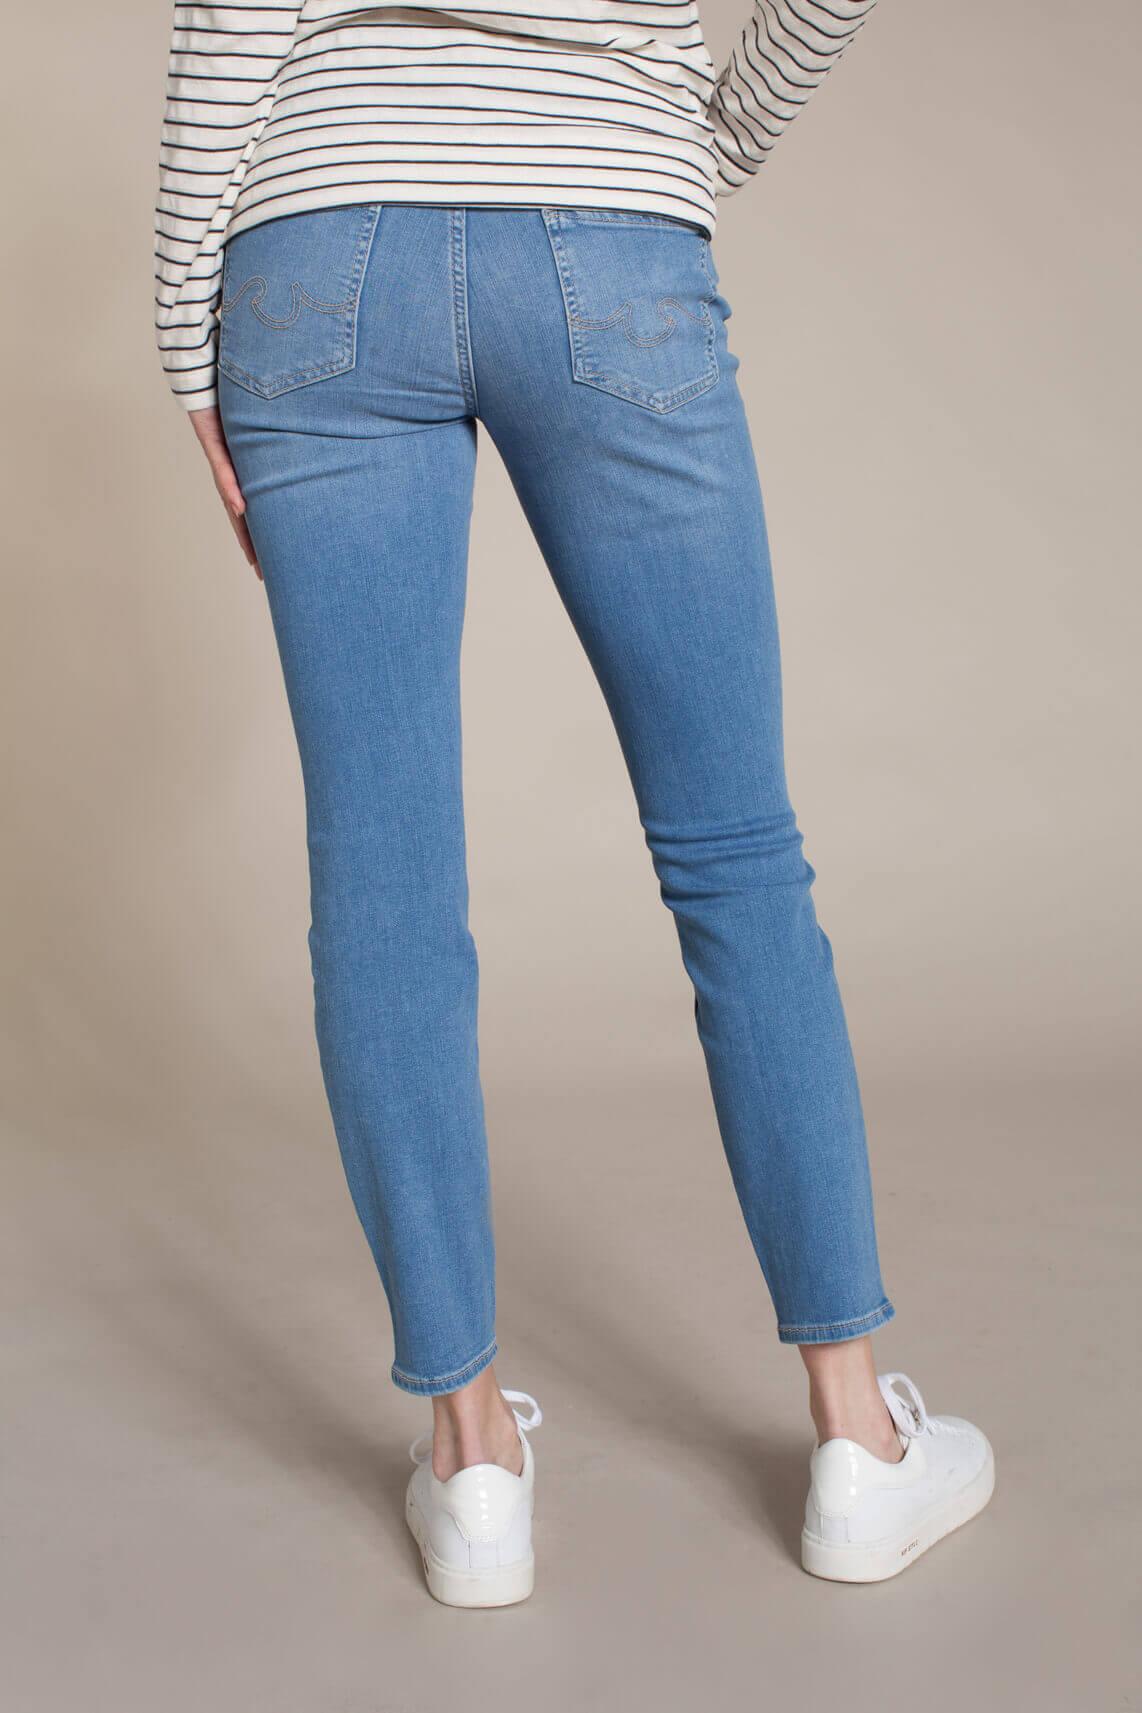 Rosner Dames L30 Audrey high waist jeans Blauw